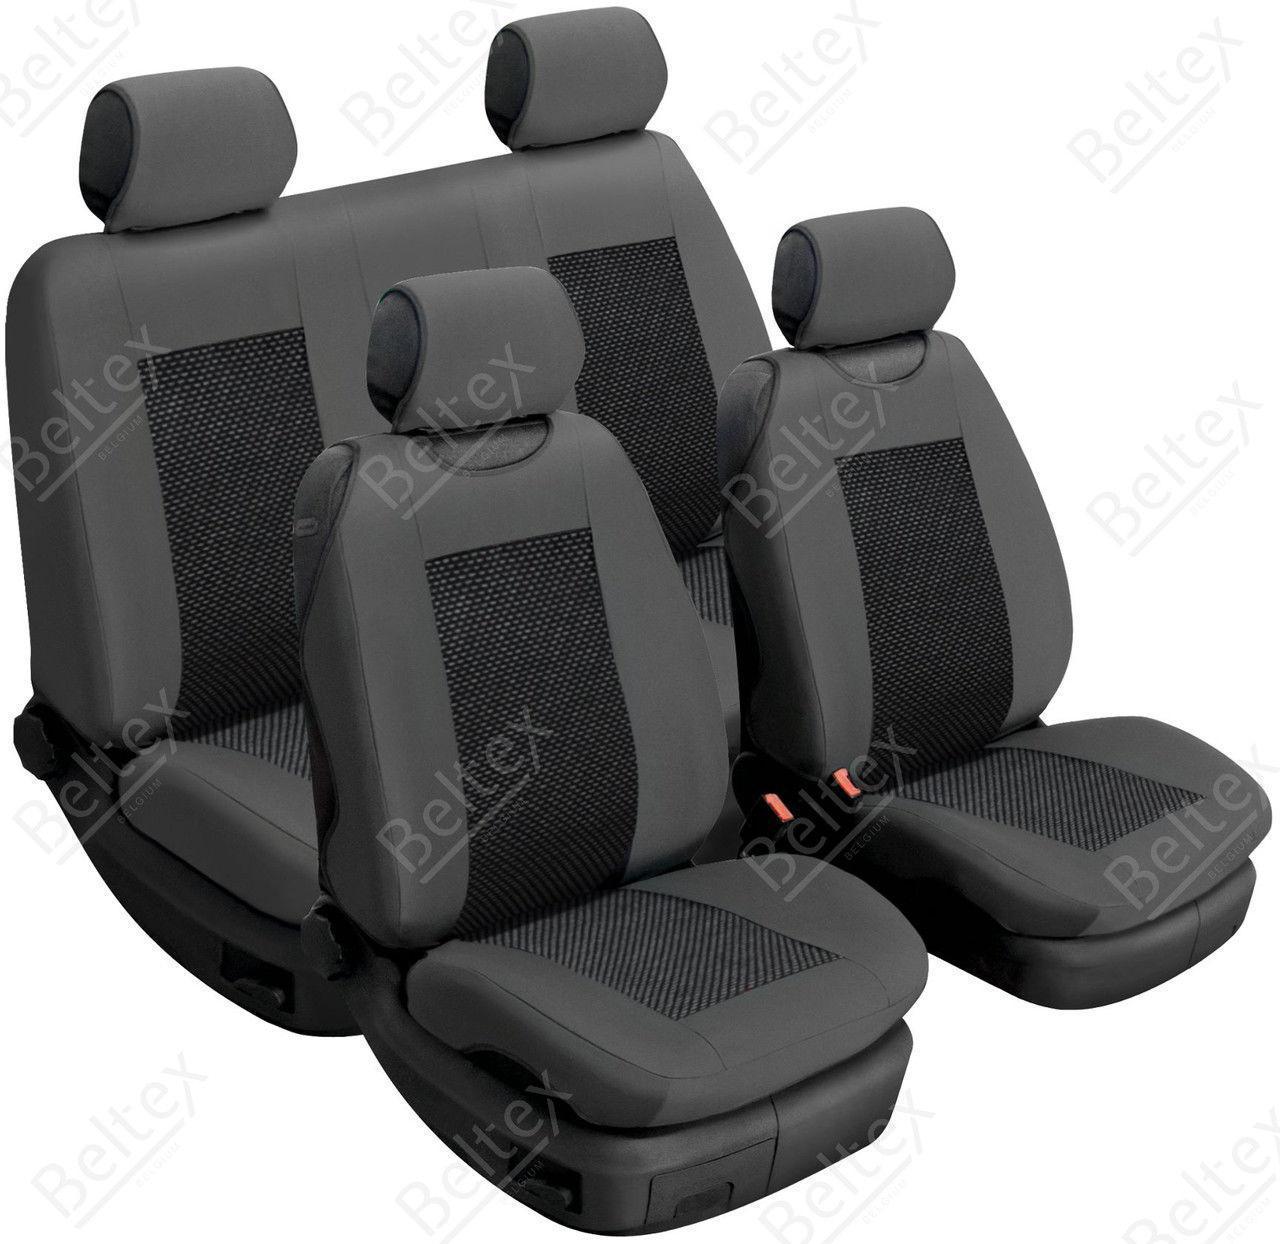 Майки/чехлы на сиденья Митсубиси Каризма (Mitsubishi Carisma)